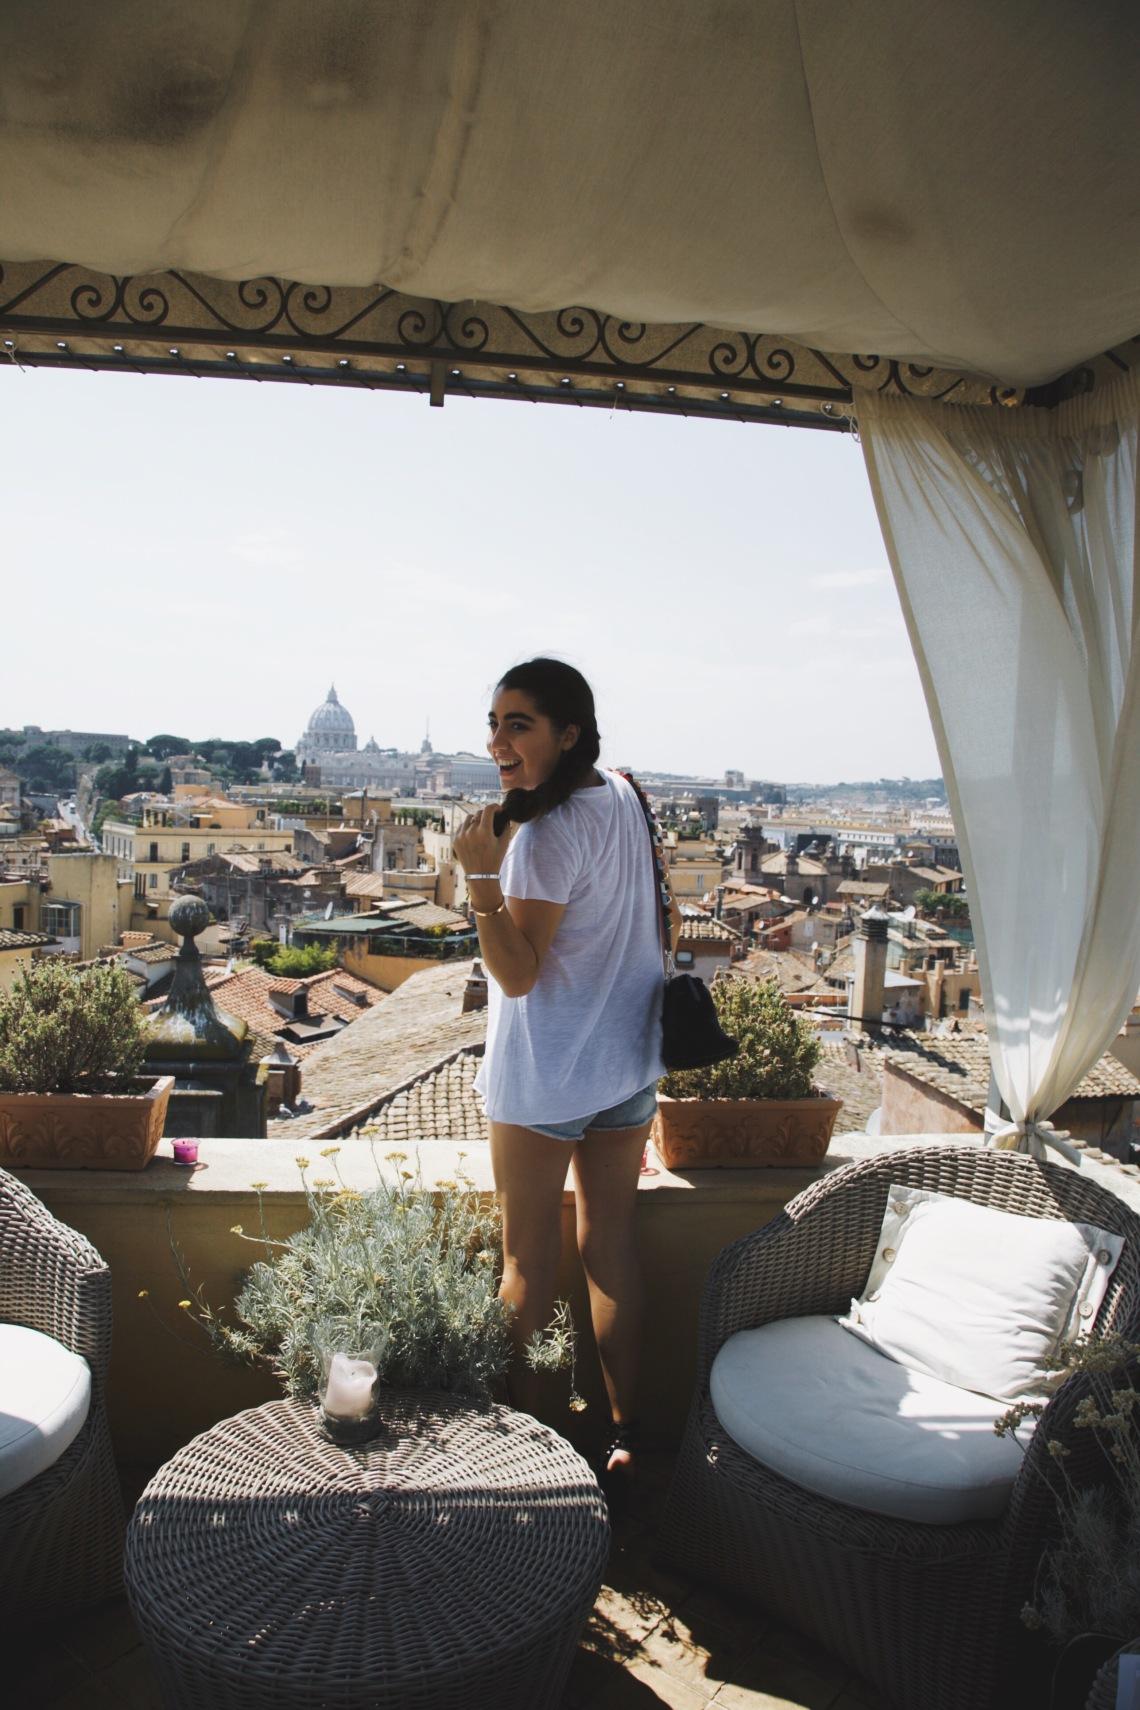 Zimmy Lifestyle A Blog By Tiffany Lea Zimmermann